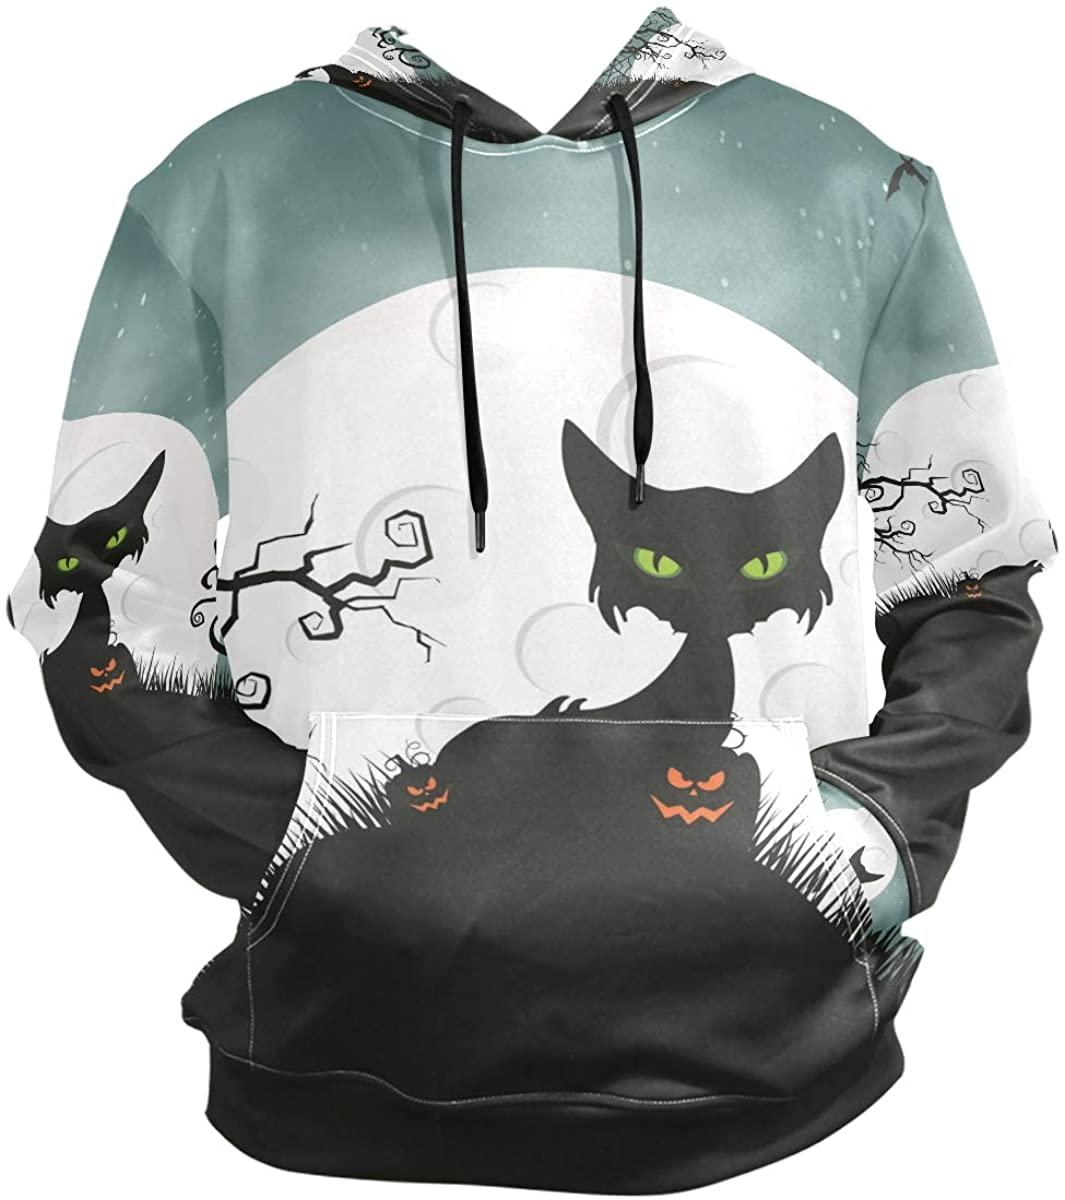 Halloween Cat Hoodies 3D Print Athletic Hooded Sweatshirts for Men Girls Boys(Health Fabric)